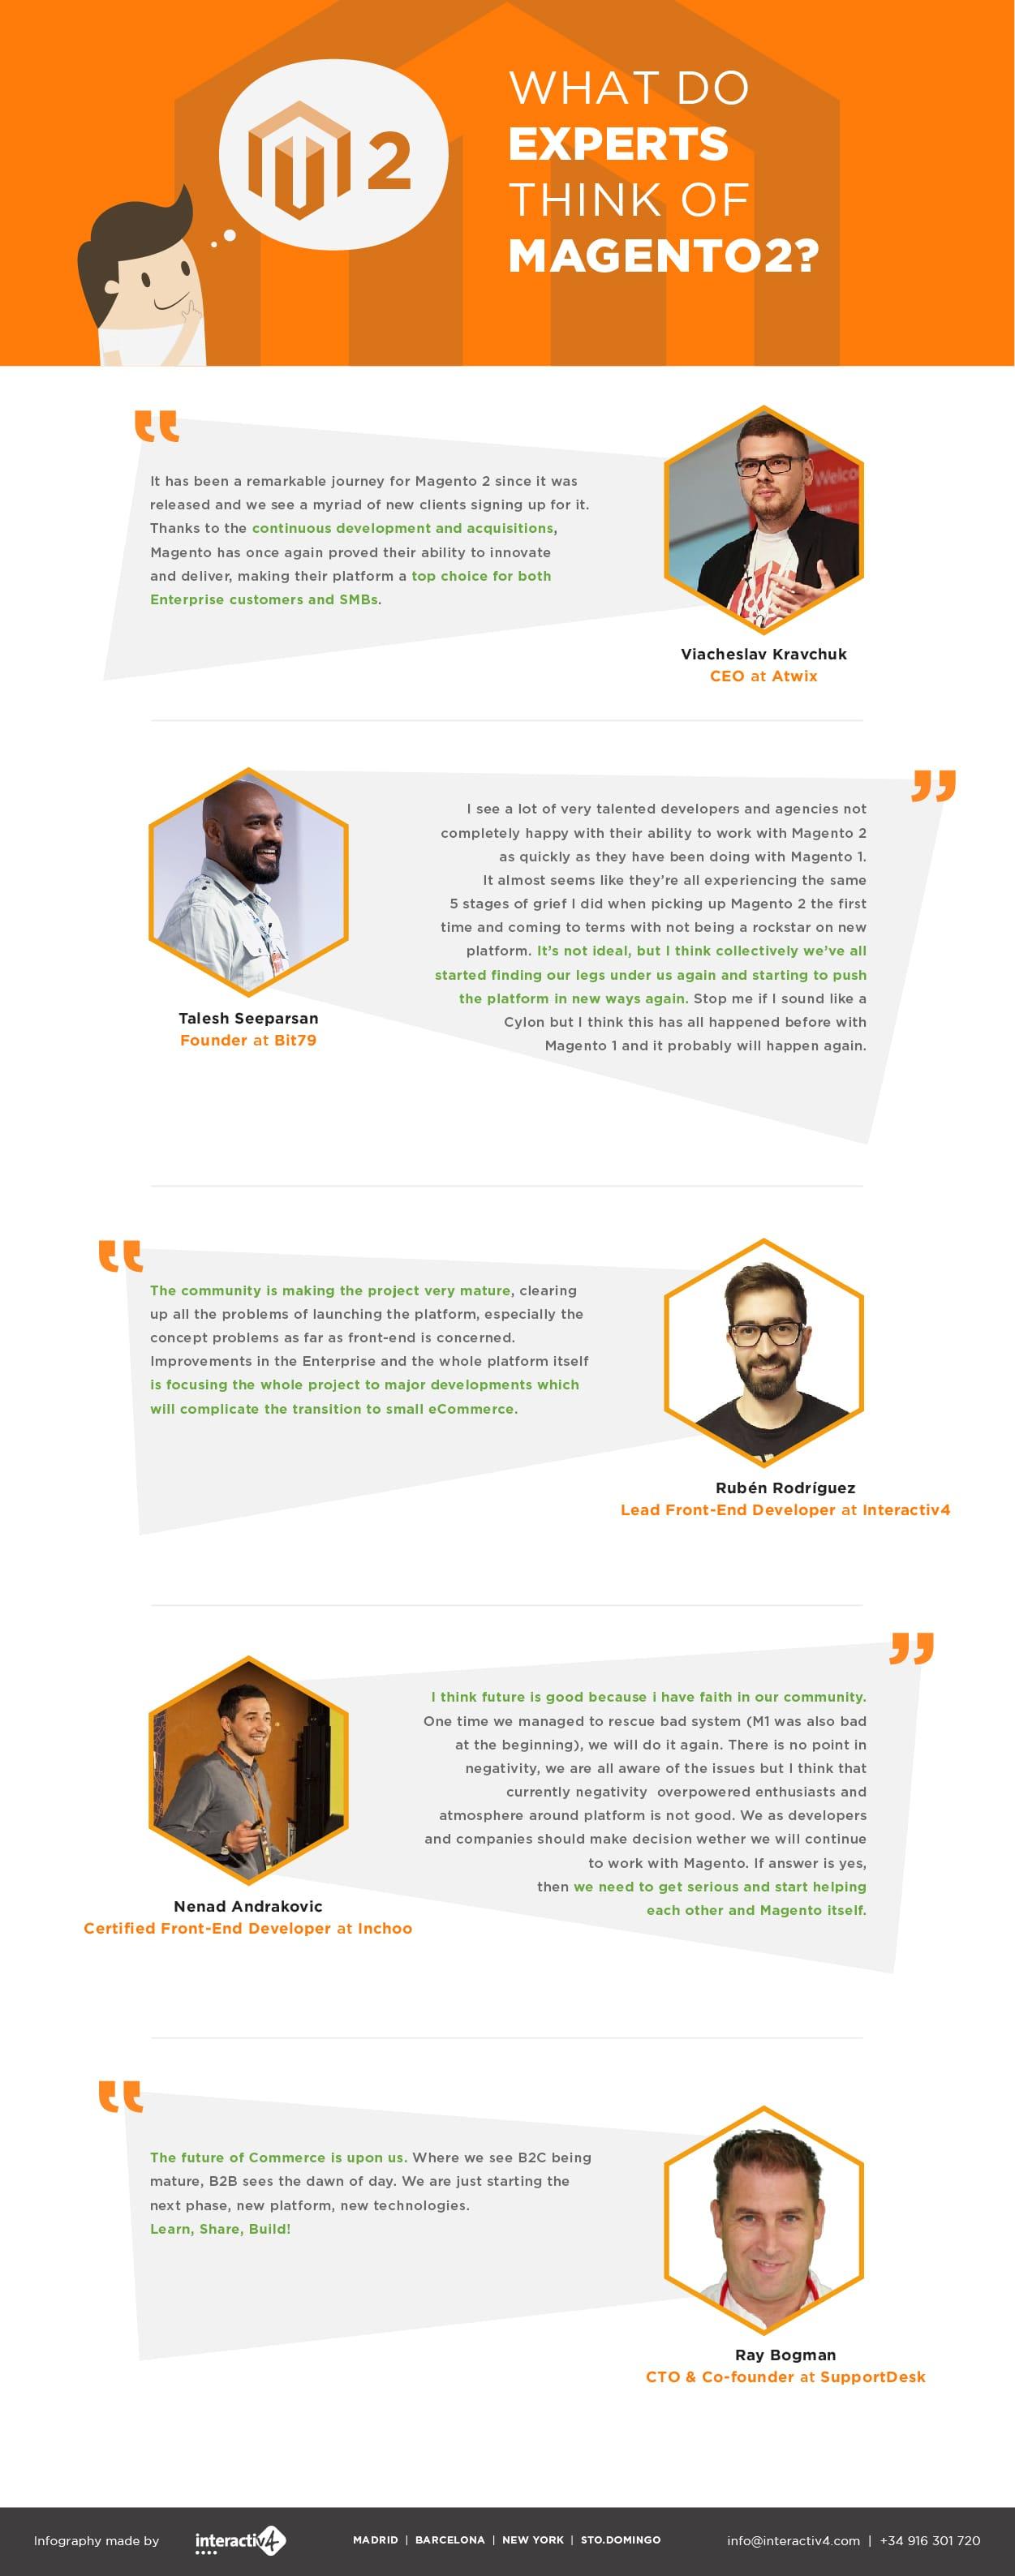 Infographic_Magento2_Future